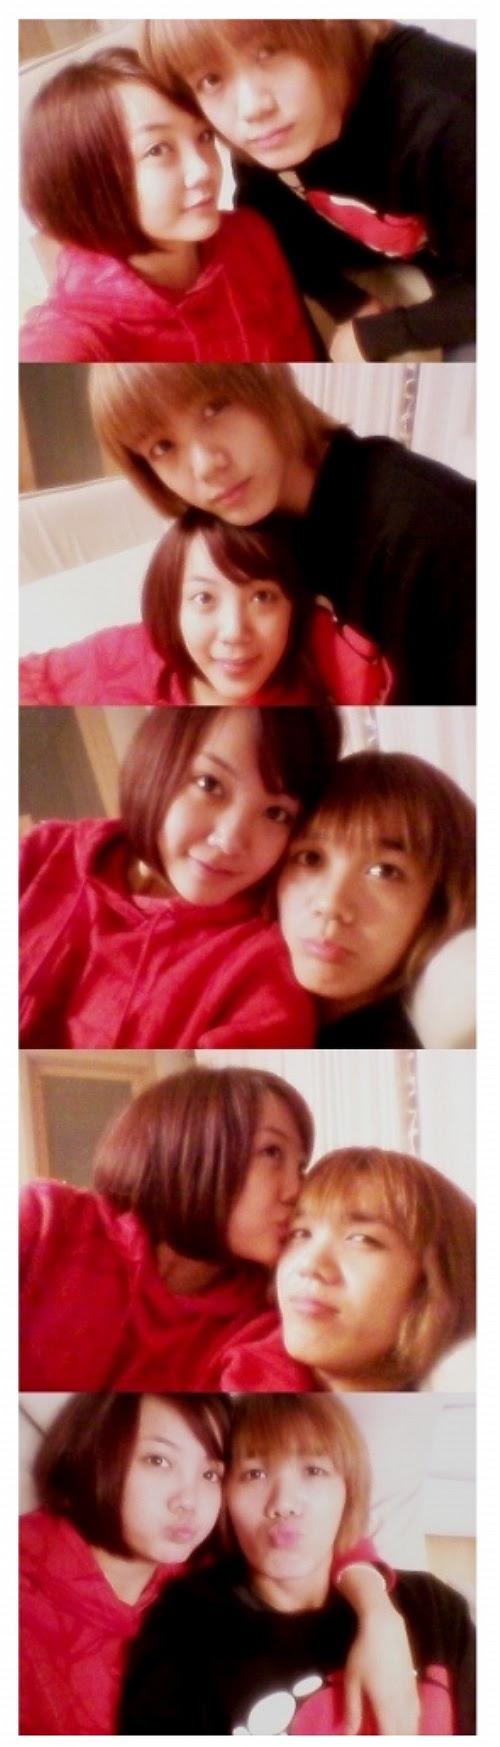 http://sookyeong.files.wordpress.com/2010/03/201003191433385443.jpg